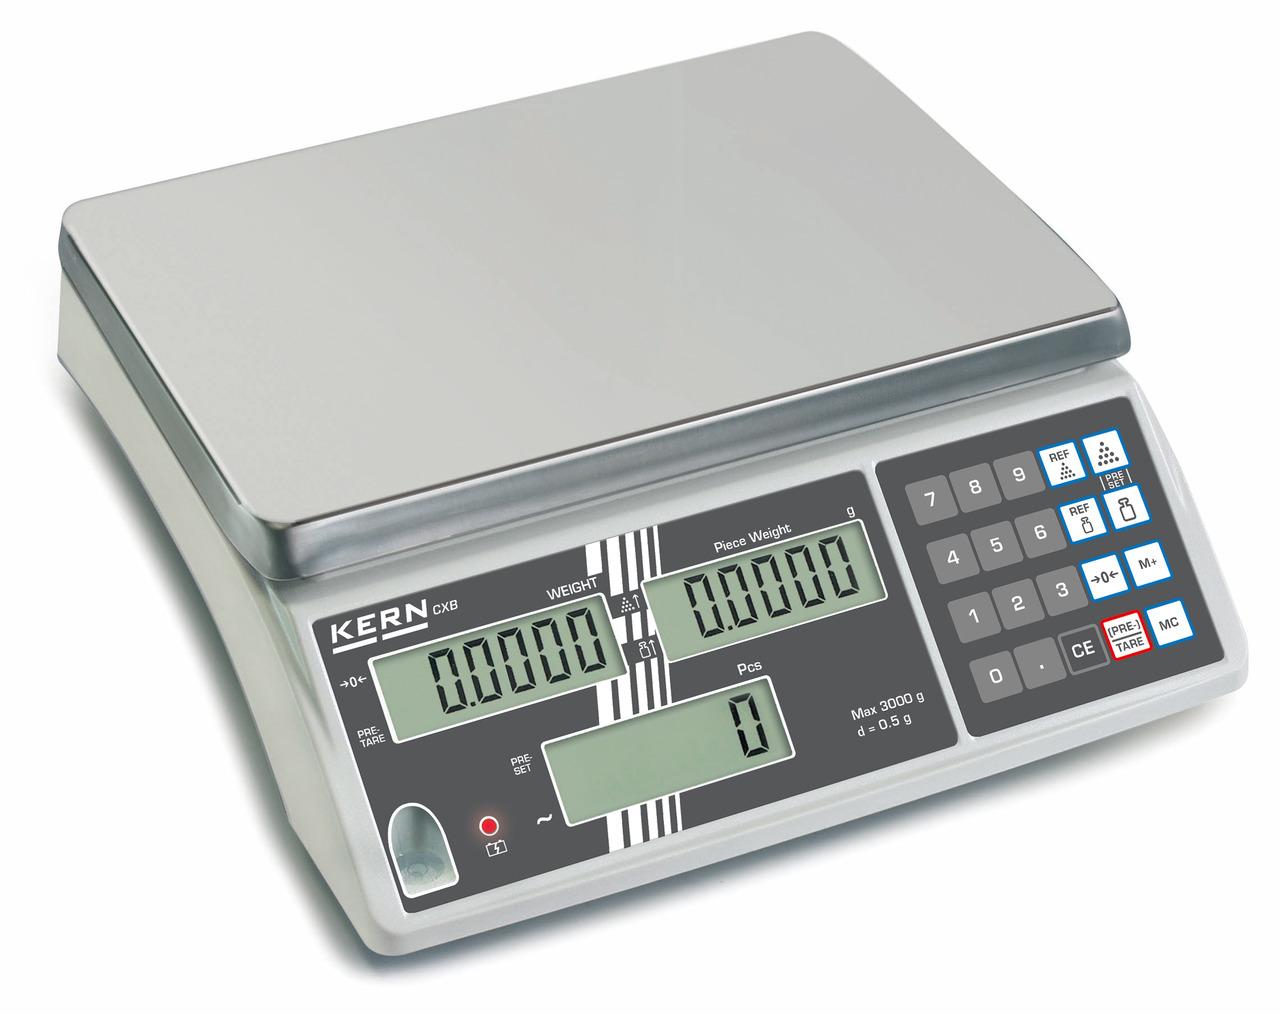 KERN Zählwaagen - 3000 g / 1 g - optional geeicht KERN Zählwaage CXB 3K1NM